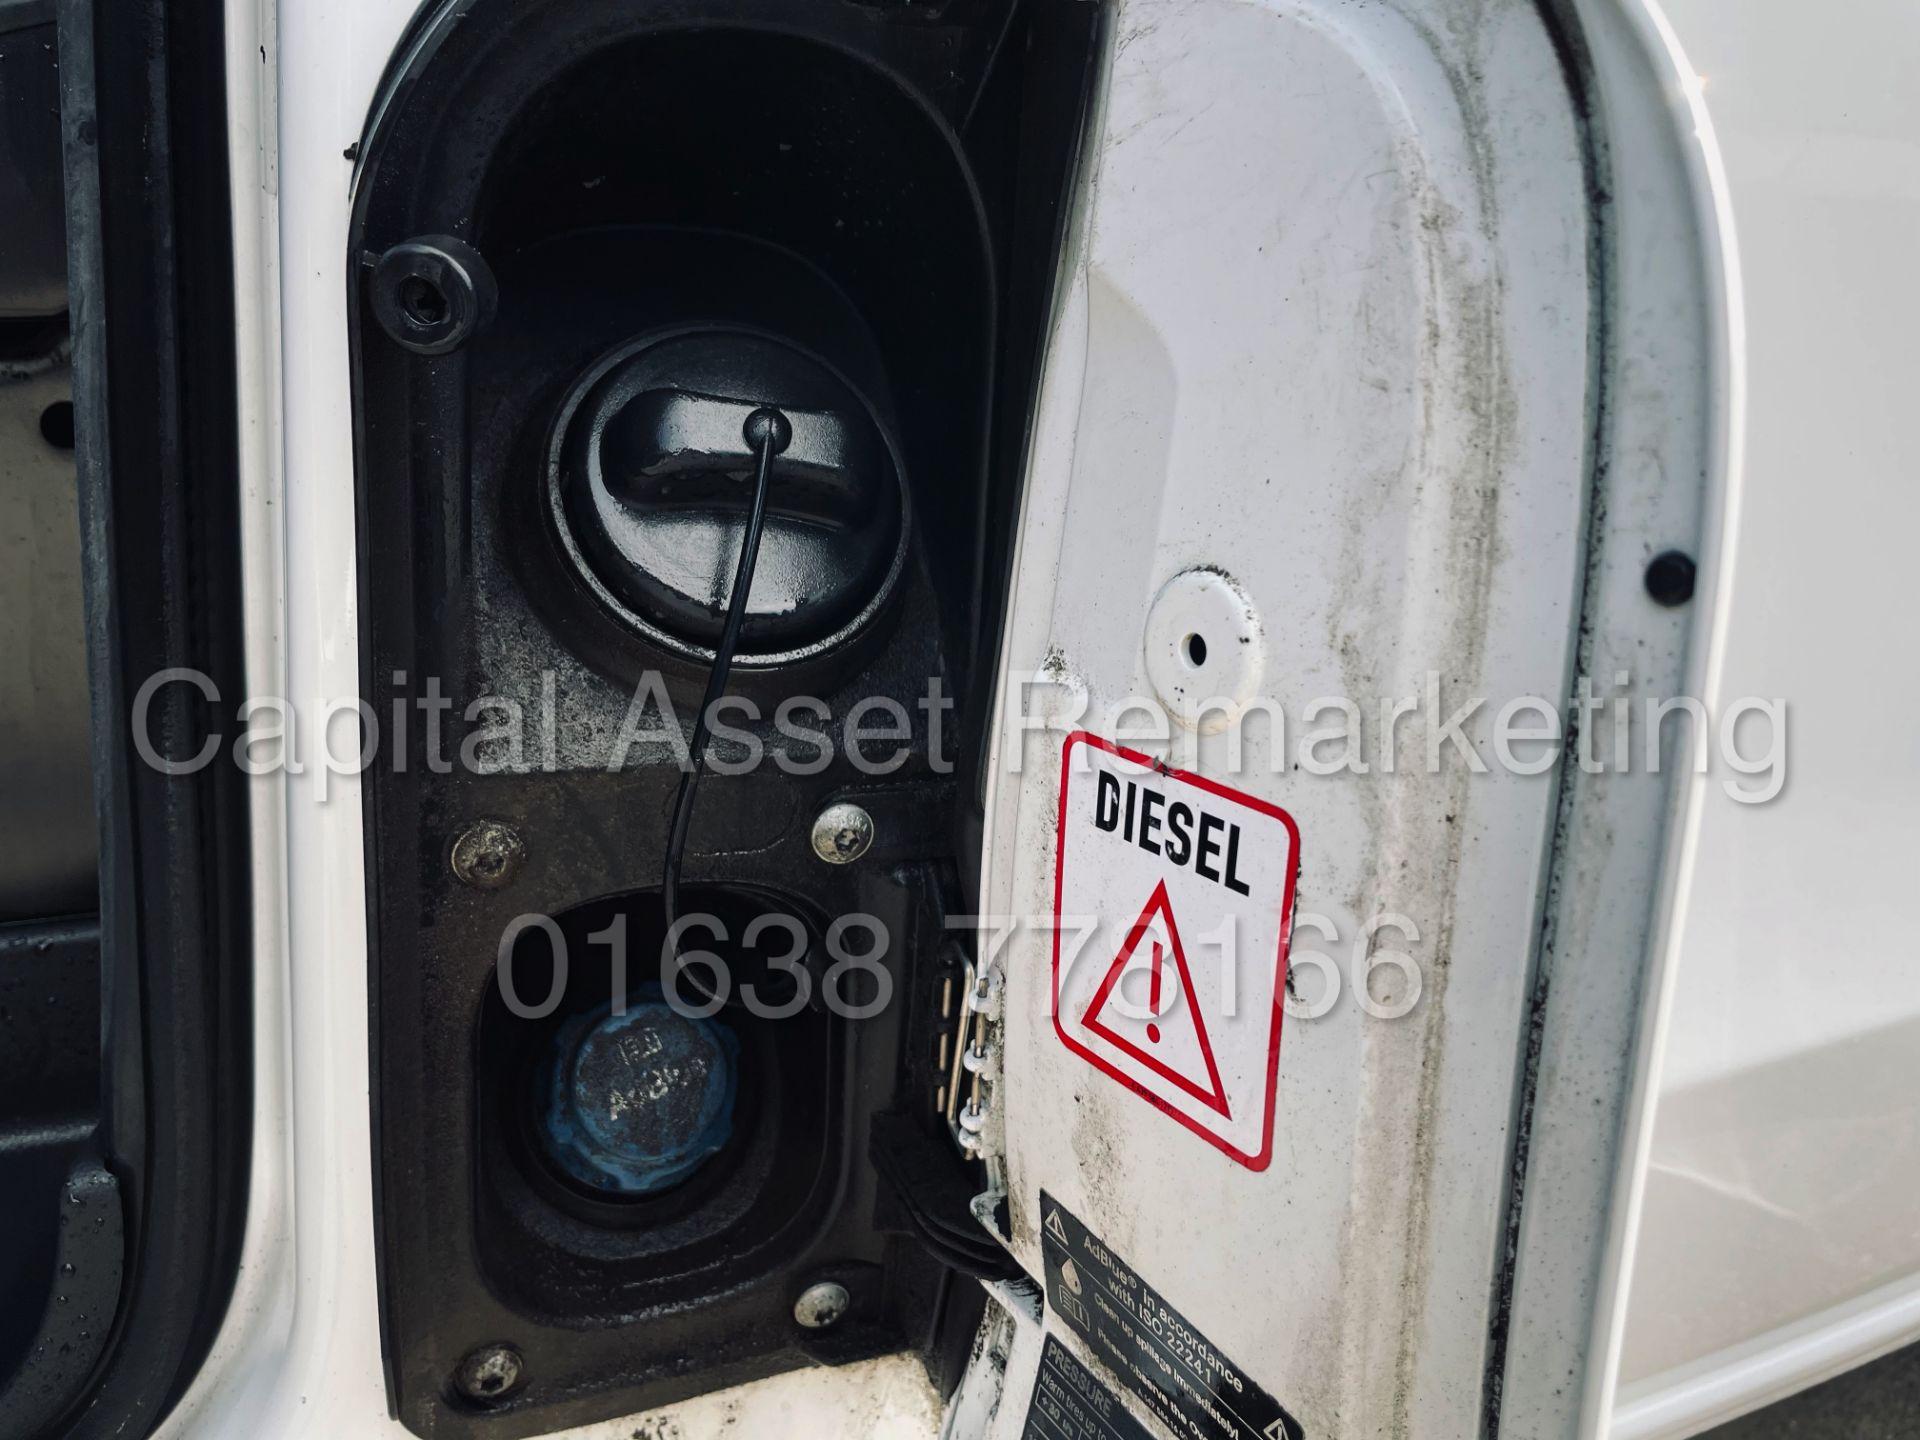 (On Sale) MERCEDES-BENZ VITO 114 *LWB -PANEL VAN* (2017 - EURO 6) '134 BHP - 6 SPEED' *65,000 MILES* - Image 15 of 34